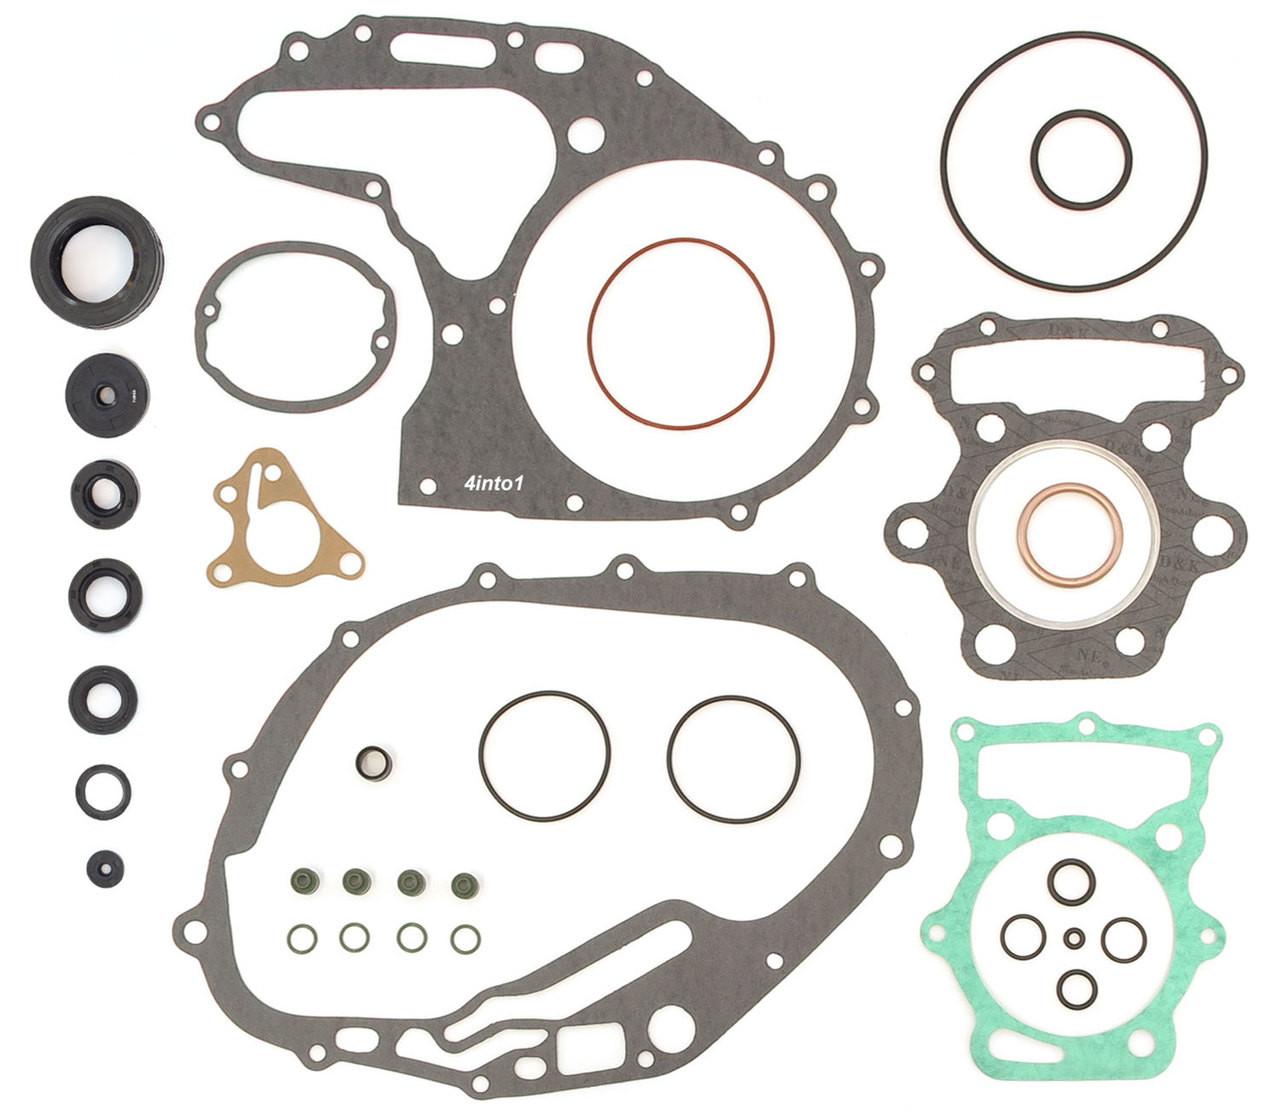 Gasket Set Engine Rebuild Kit Compatible with Honda CB360 CL360-1974-1976 Seals